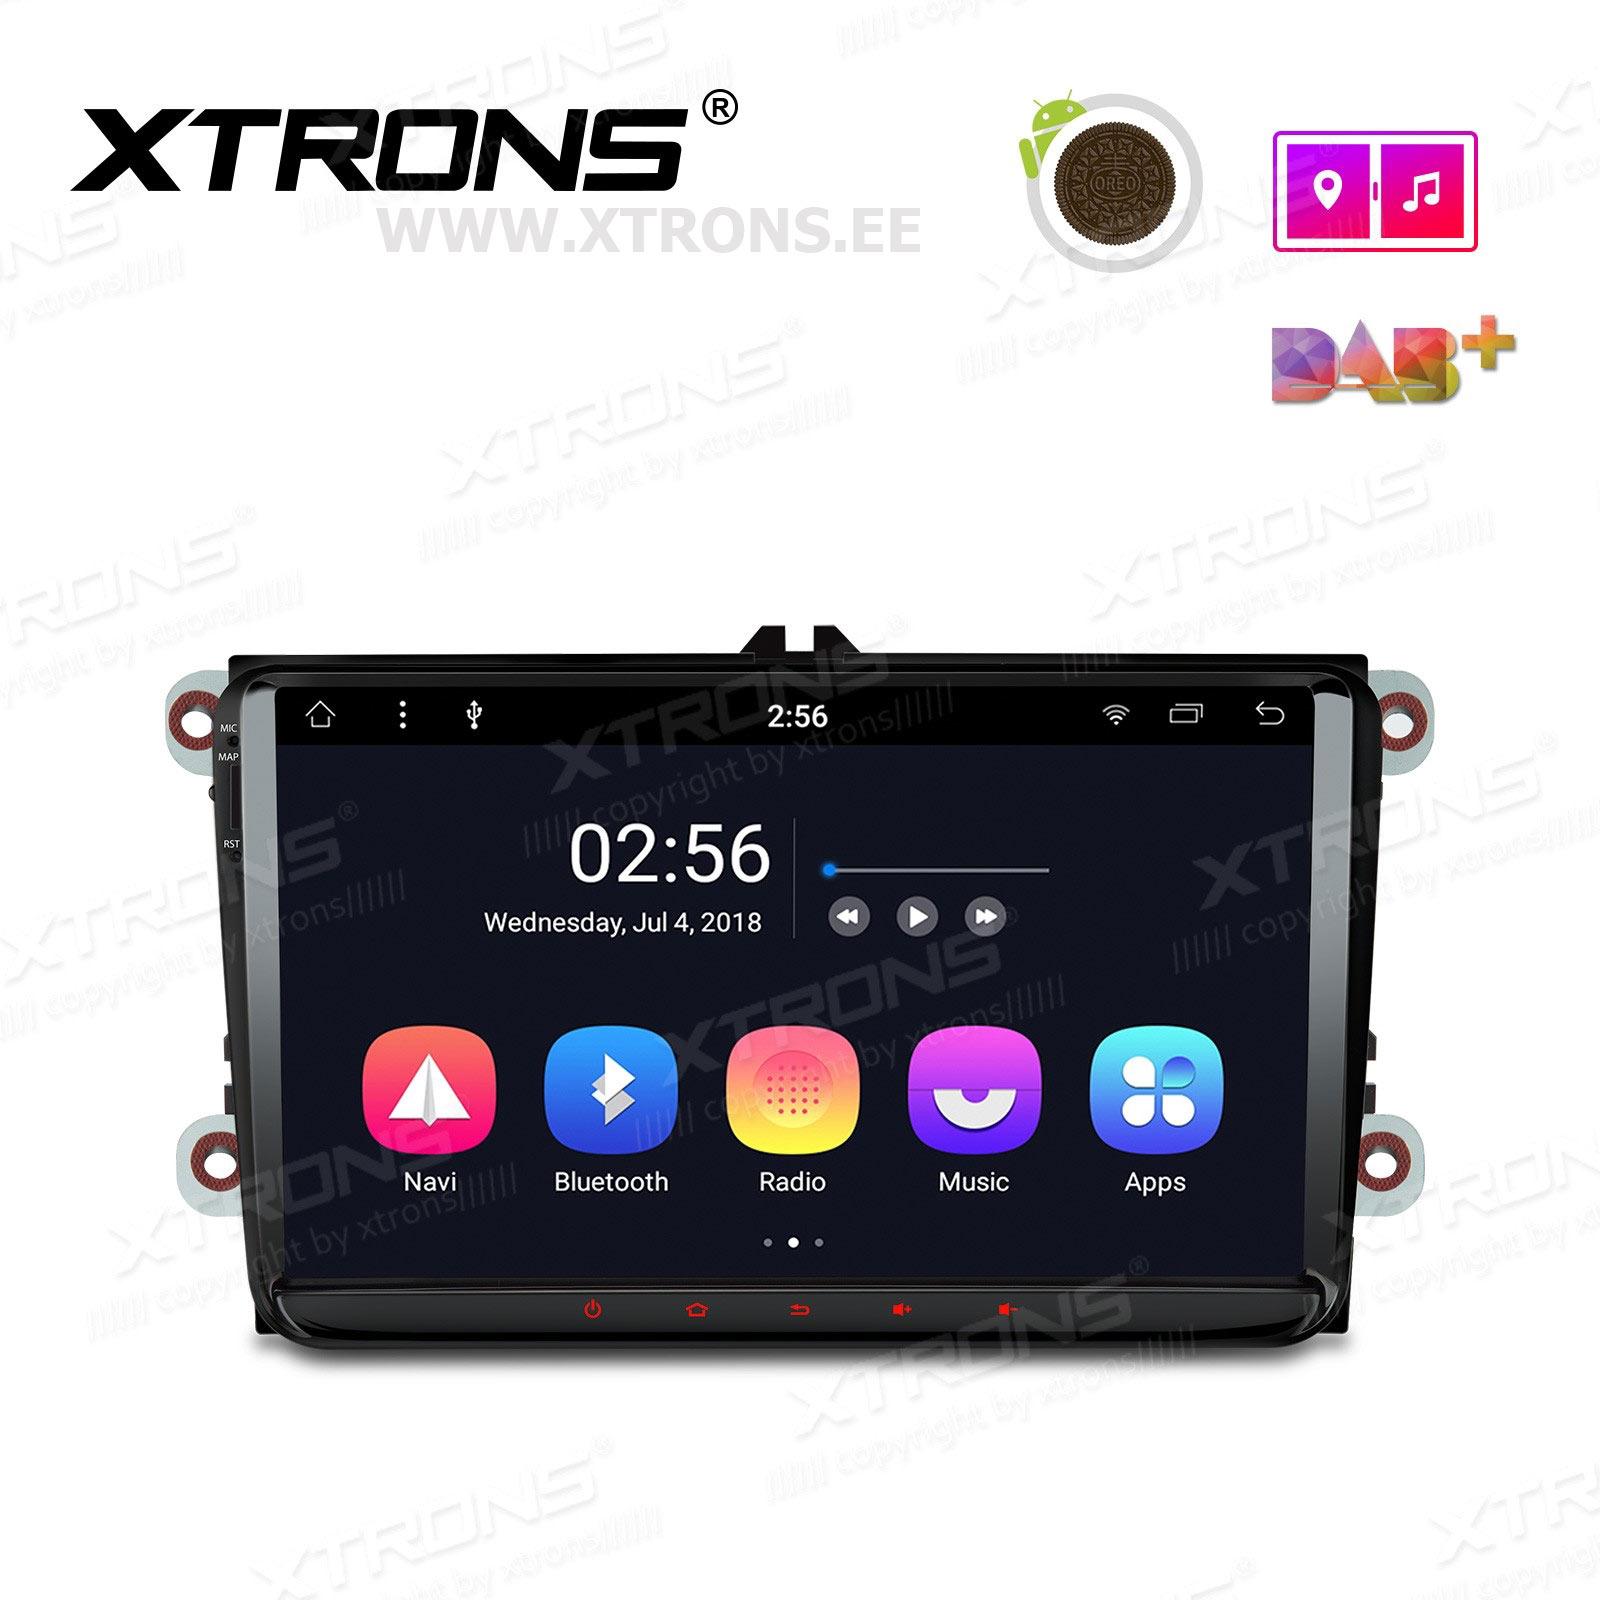 XTRONS PR98MTVL